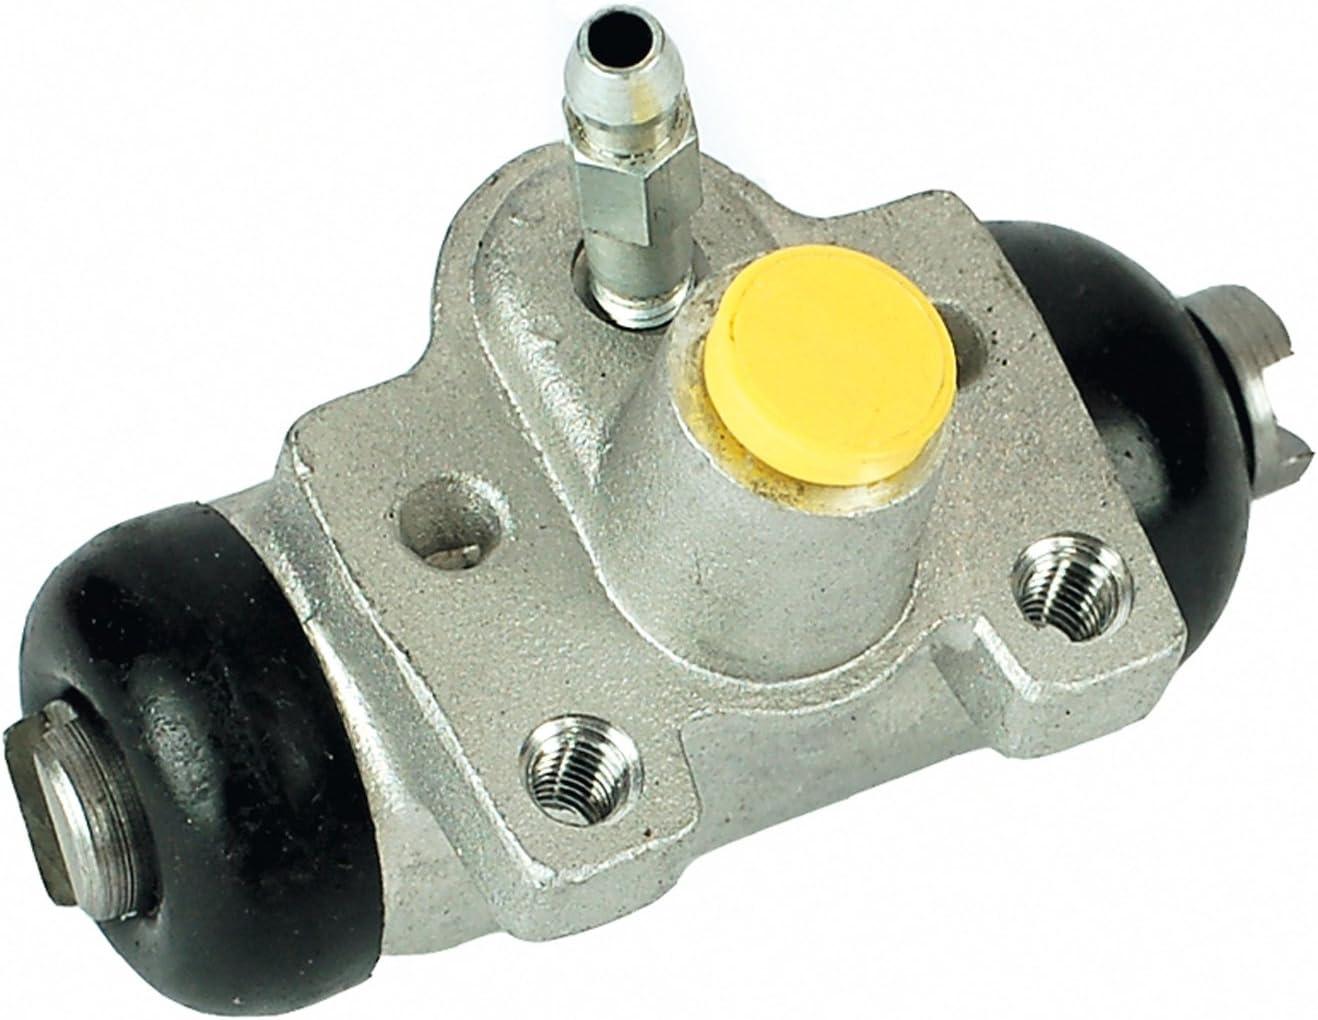 LPR Bremstrommel 2 St/ück 7D0043